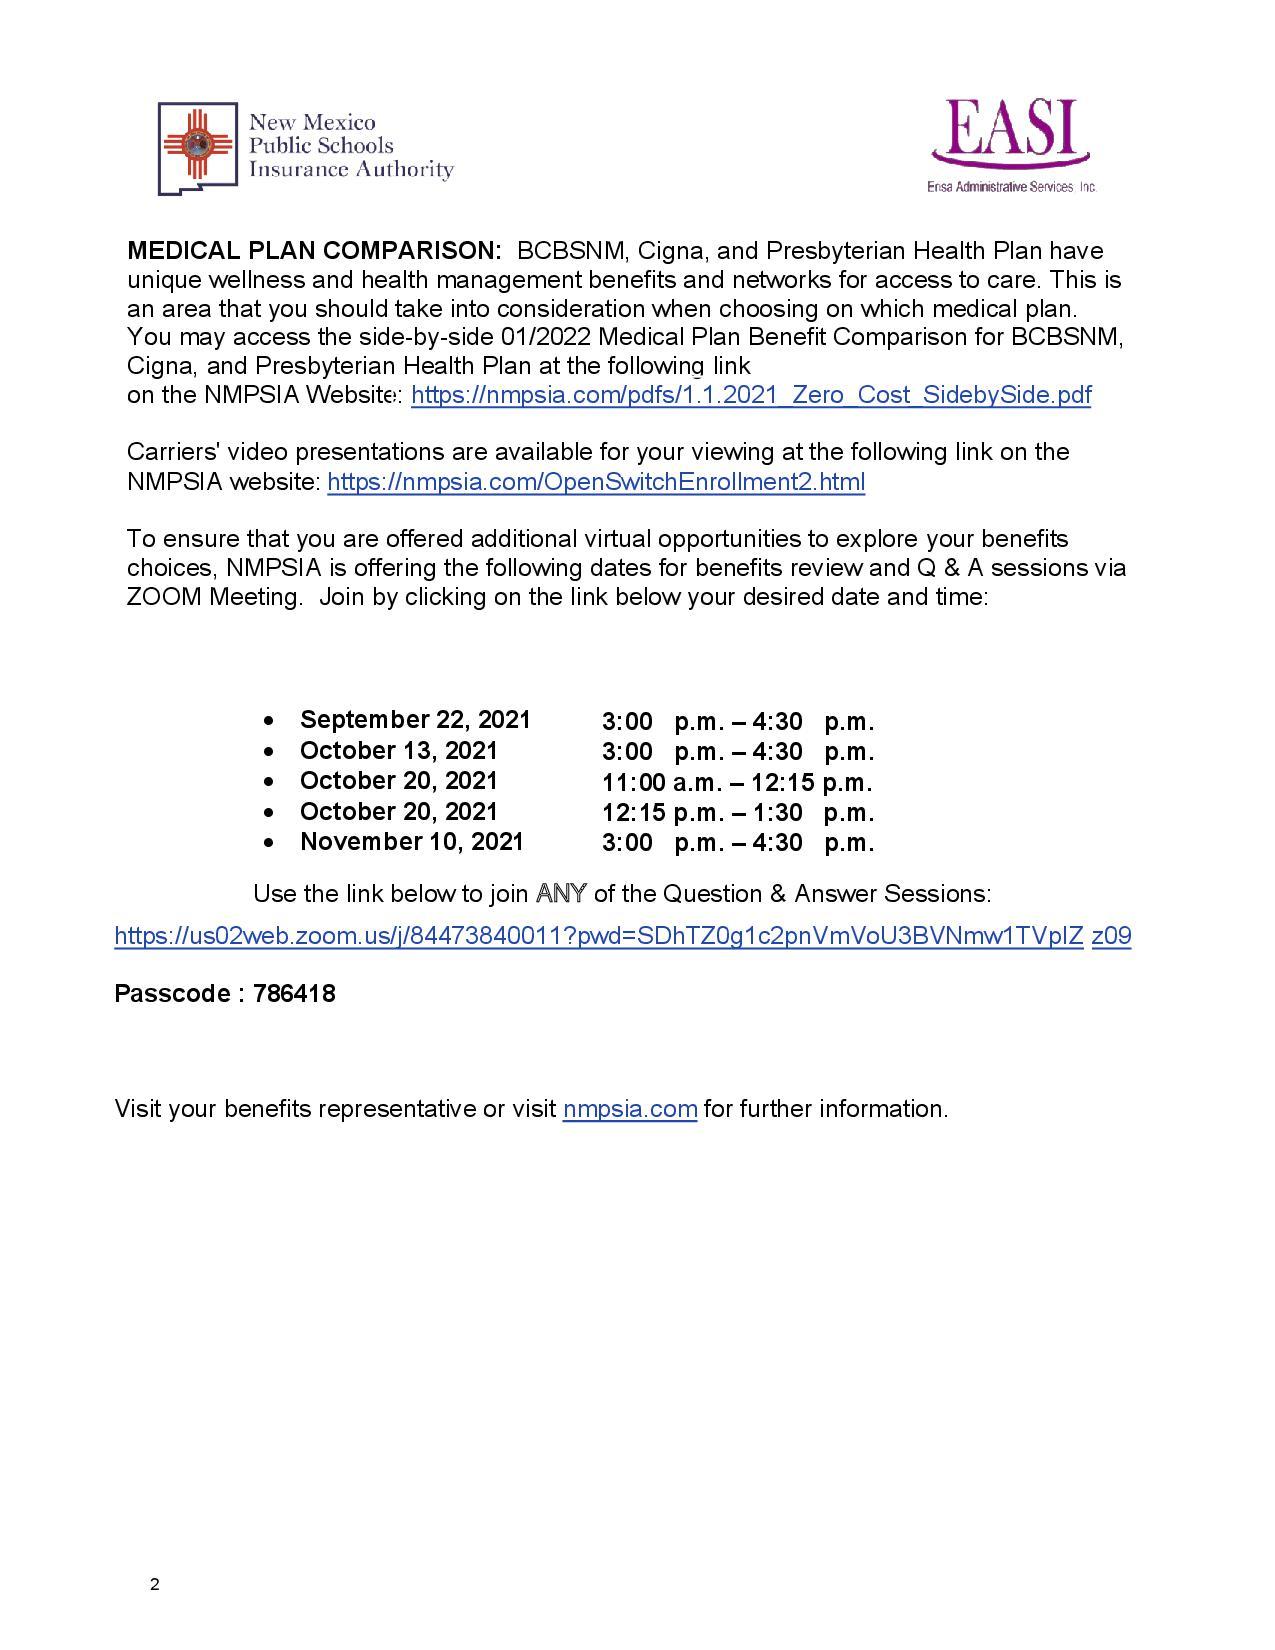 Open enrollment plan continuation